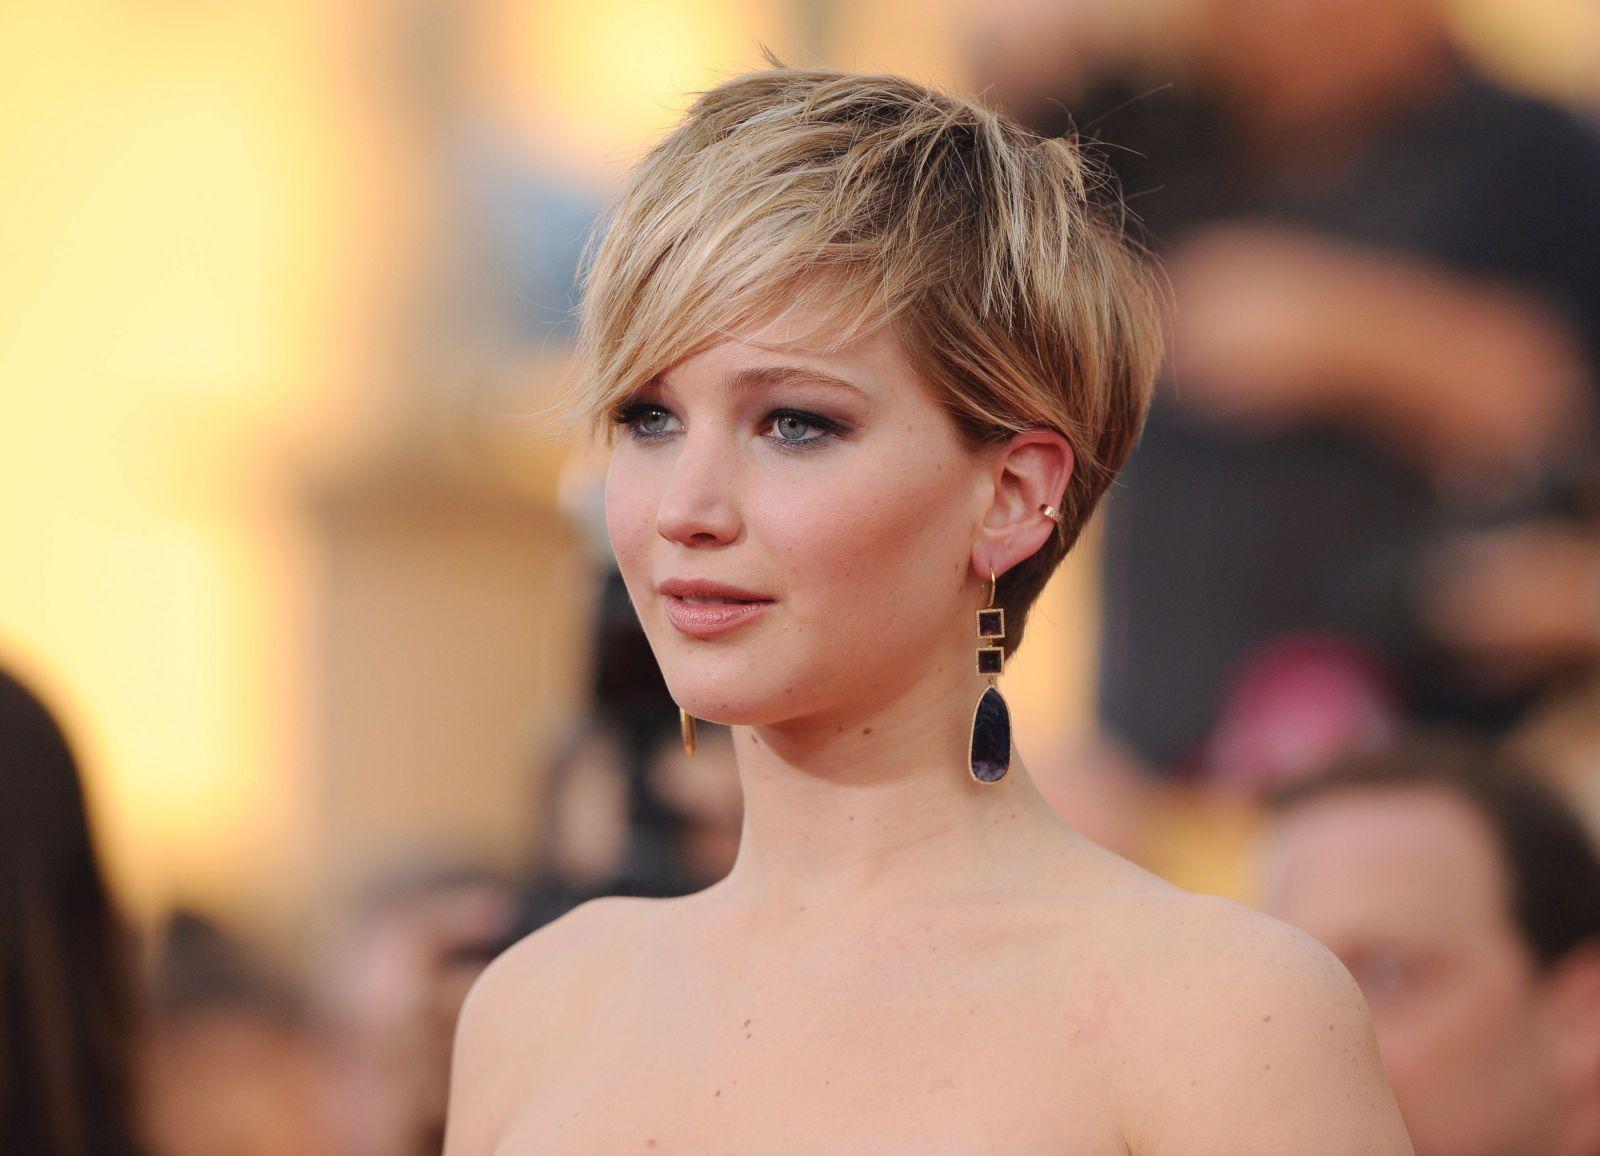 images about Beauty on Pinterest  Pixie Cuts Celebrity Pixie